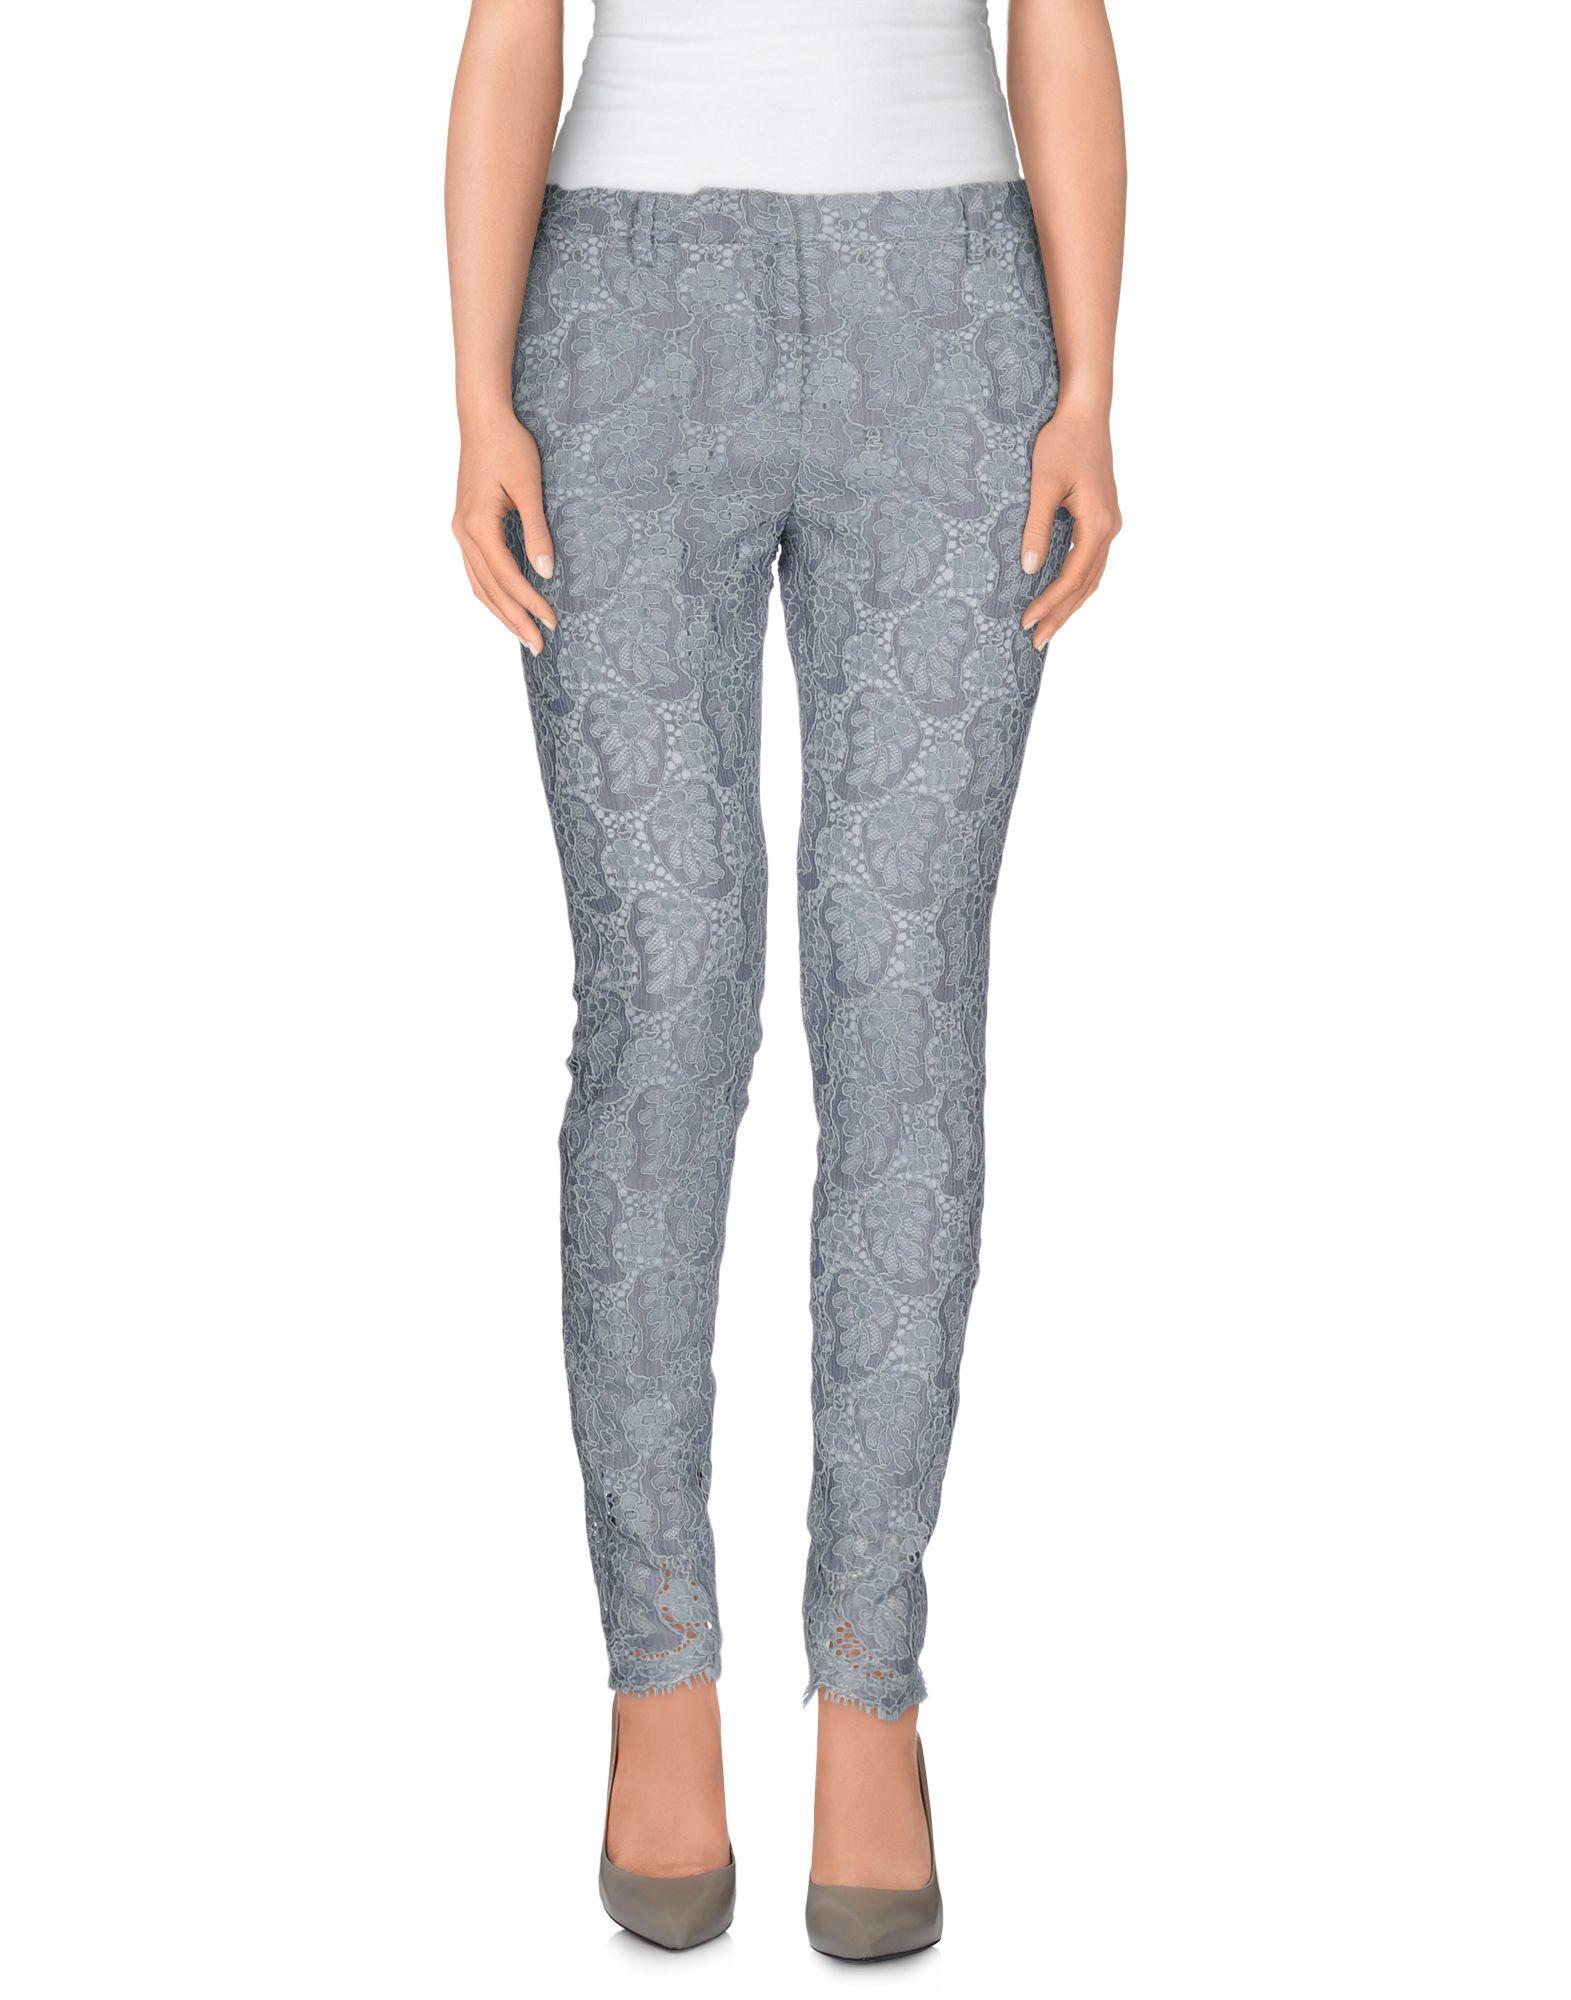 Faberge & Roches PANTALONES - Pantalones IHKXdE